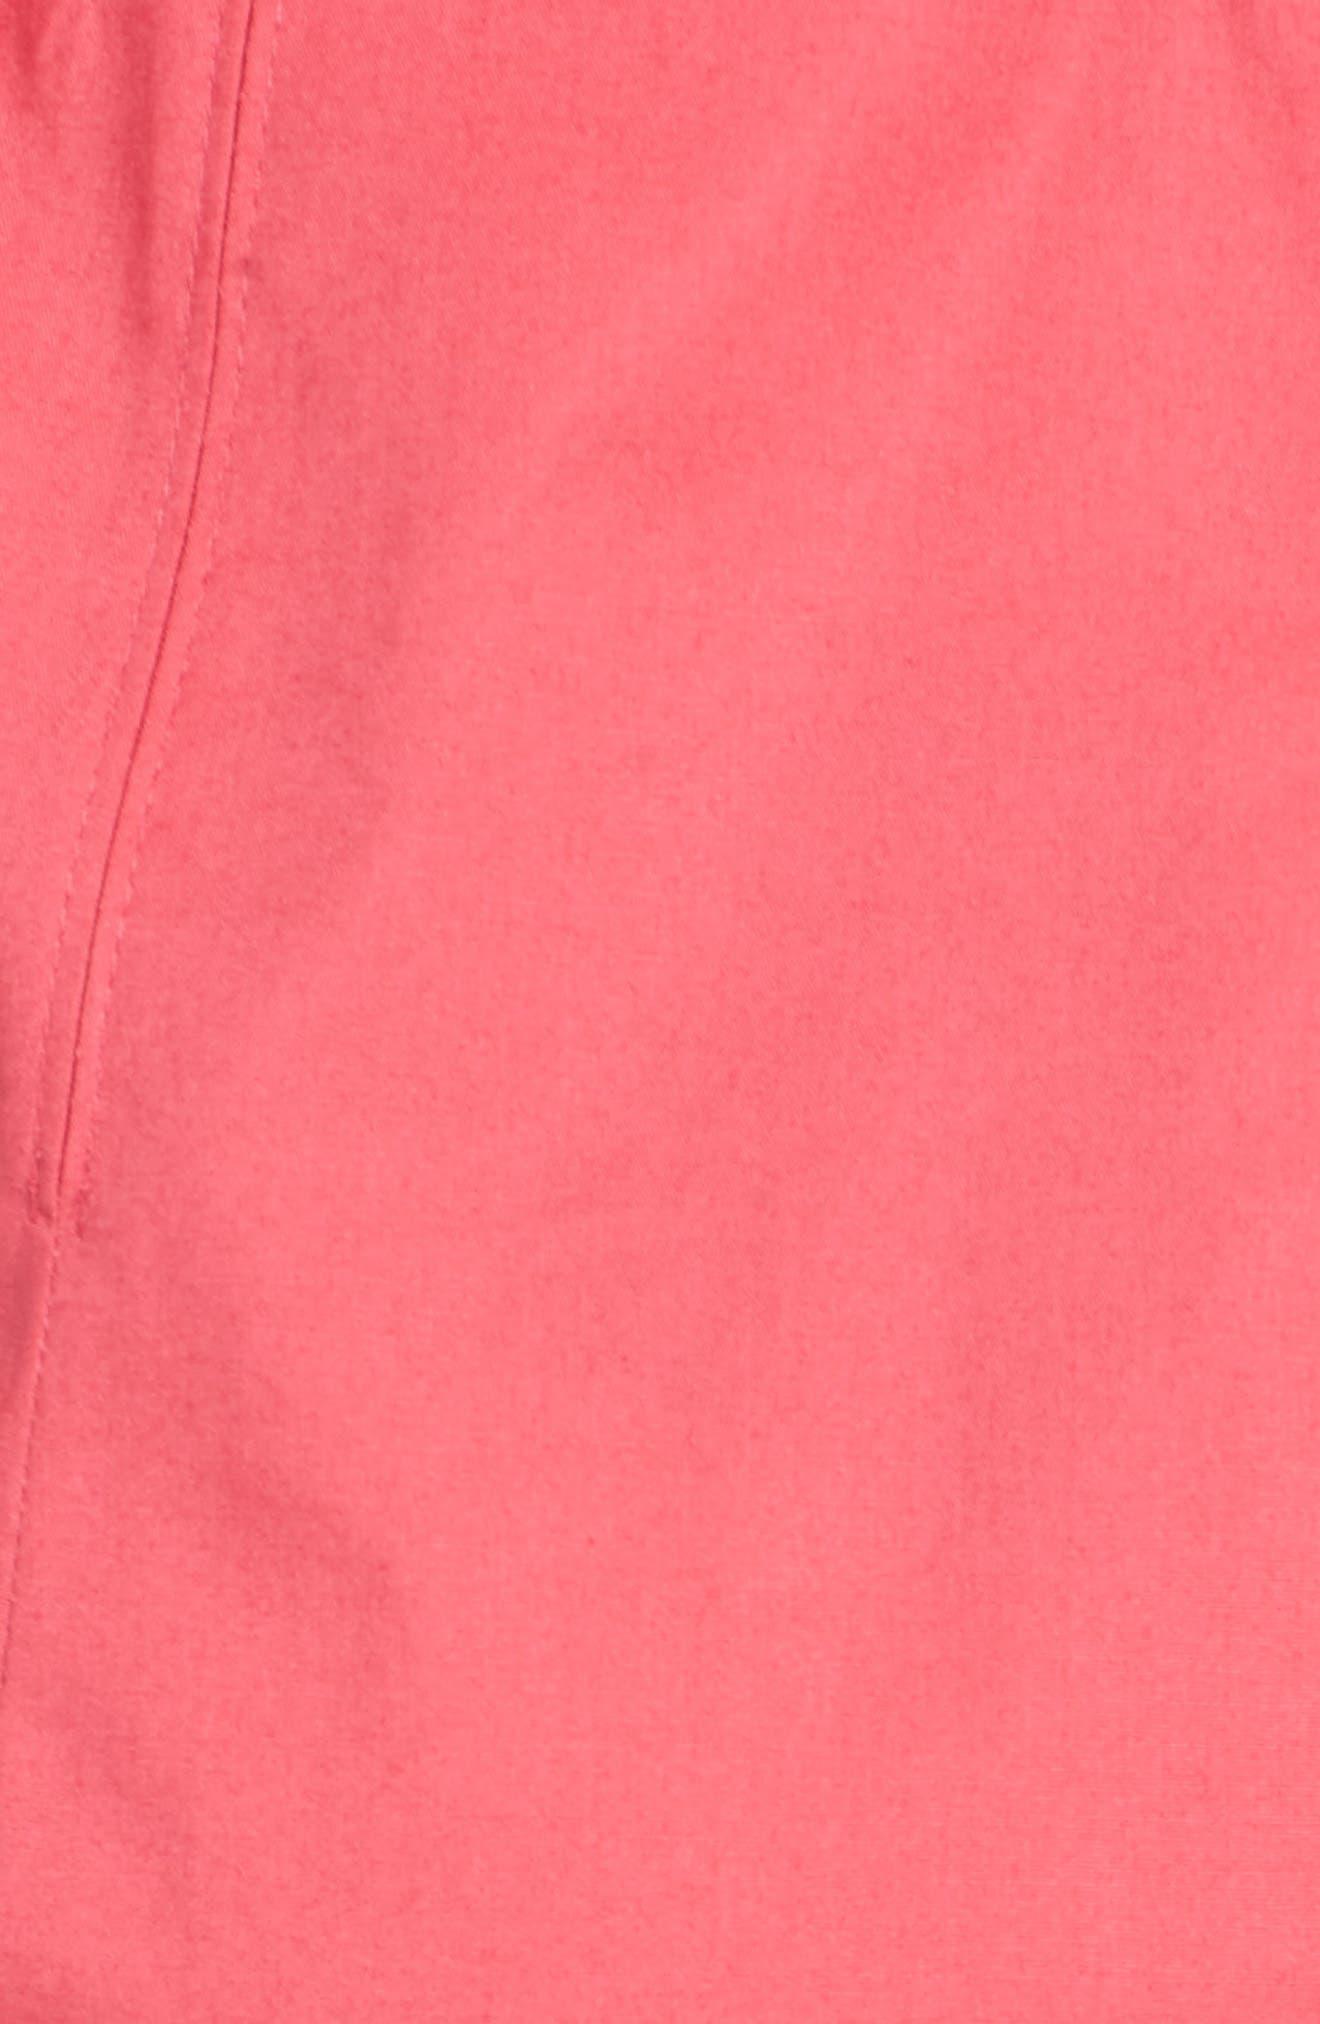 Dashiri Stretch Poplin Dress,                             Alternate thumbnail 6, color,                             Lychee Pink